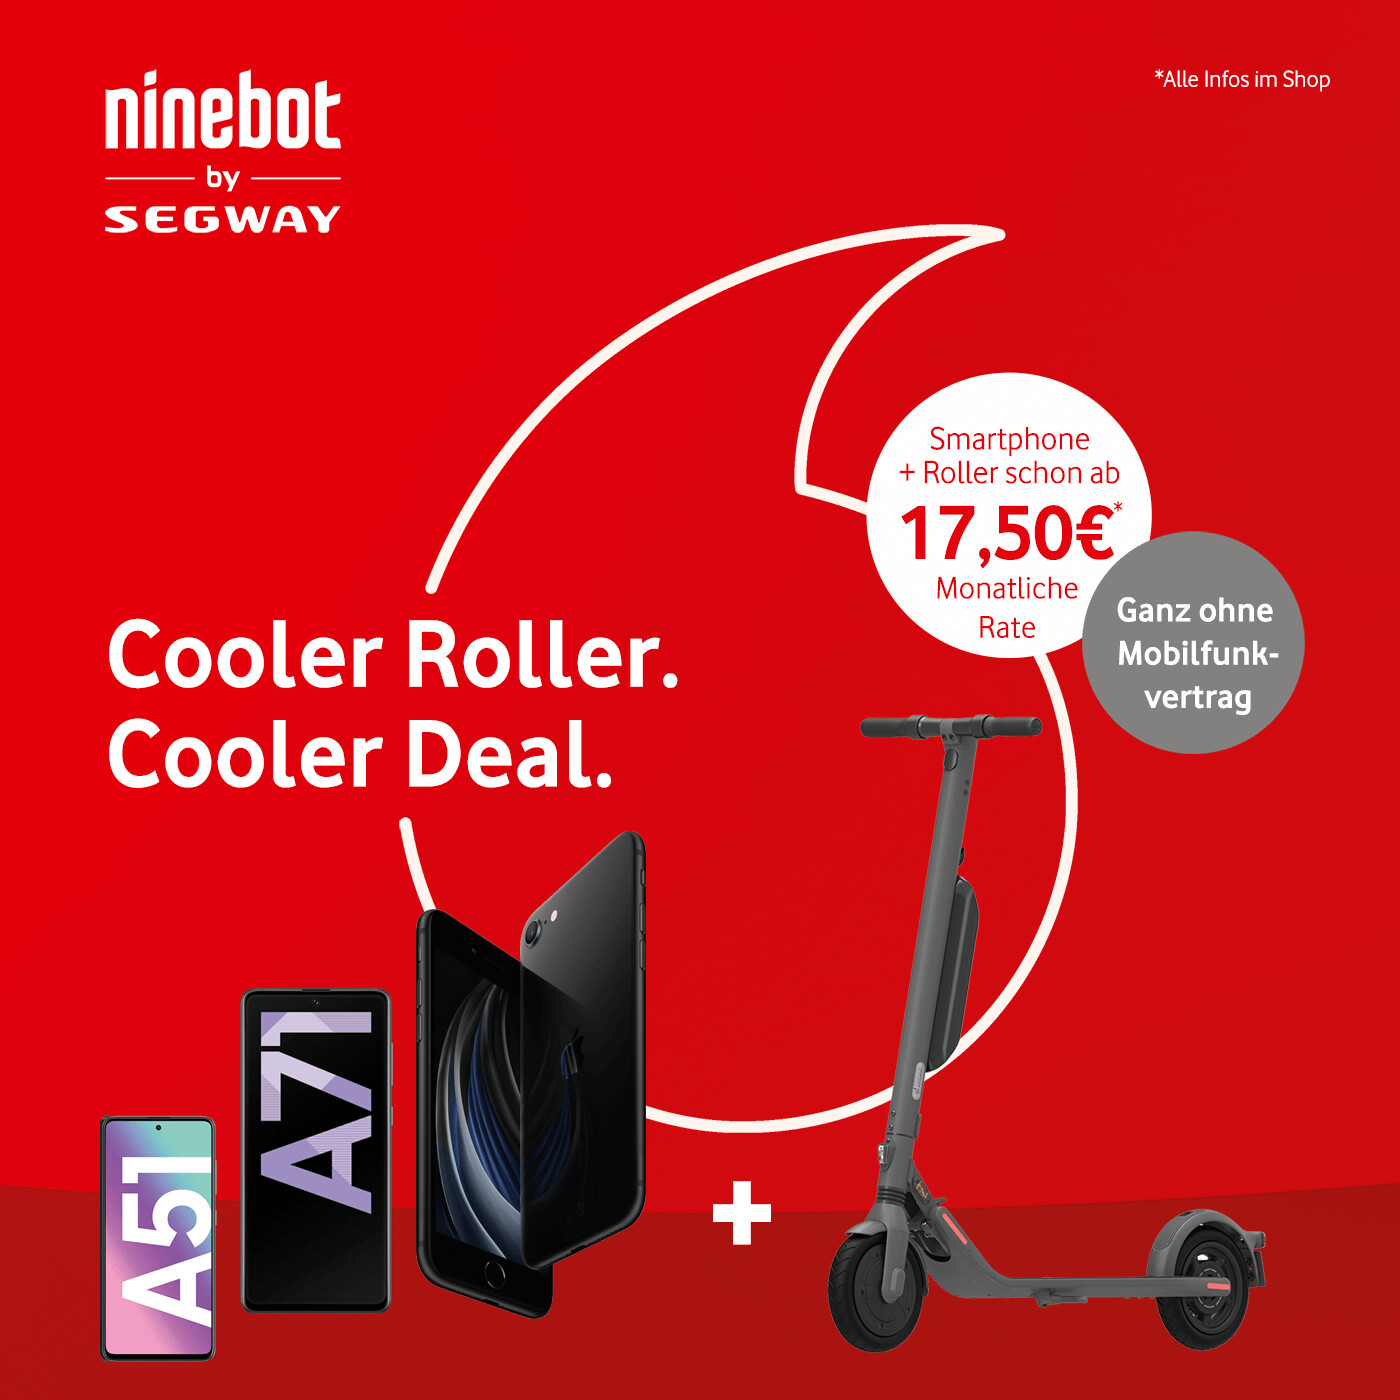 Wunsch-Smartphone inkl. Segway Ninebot E-Roller ab nur 17,50€ monatlich